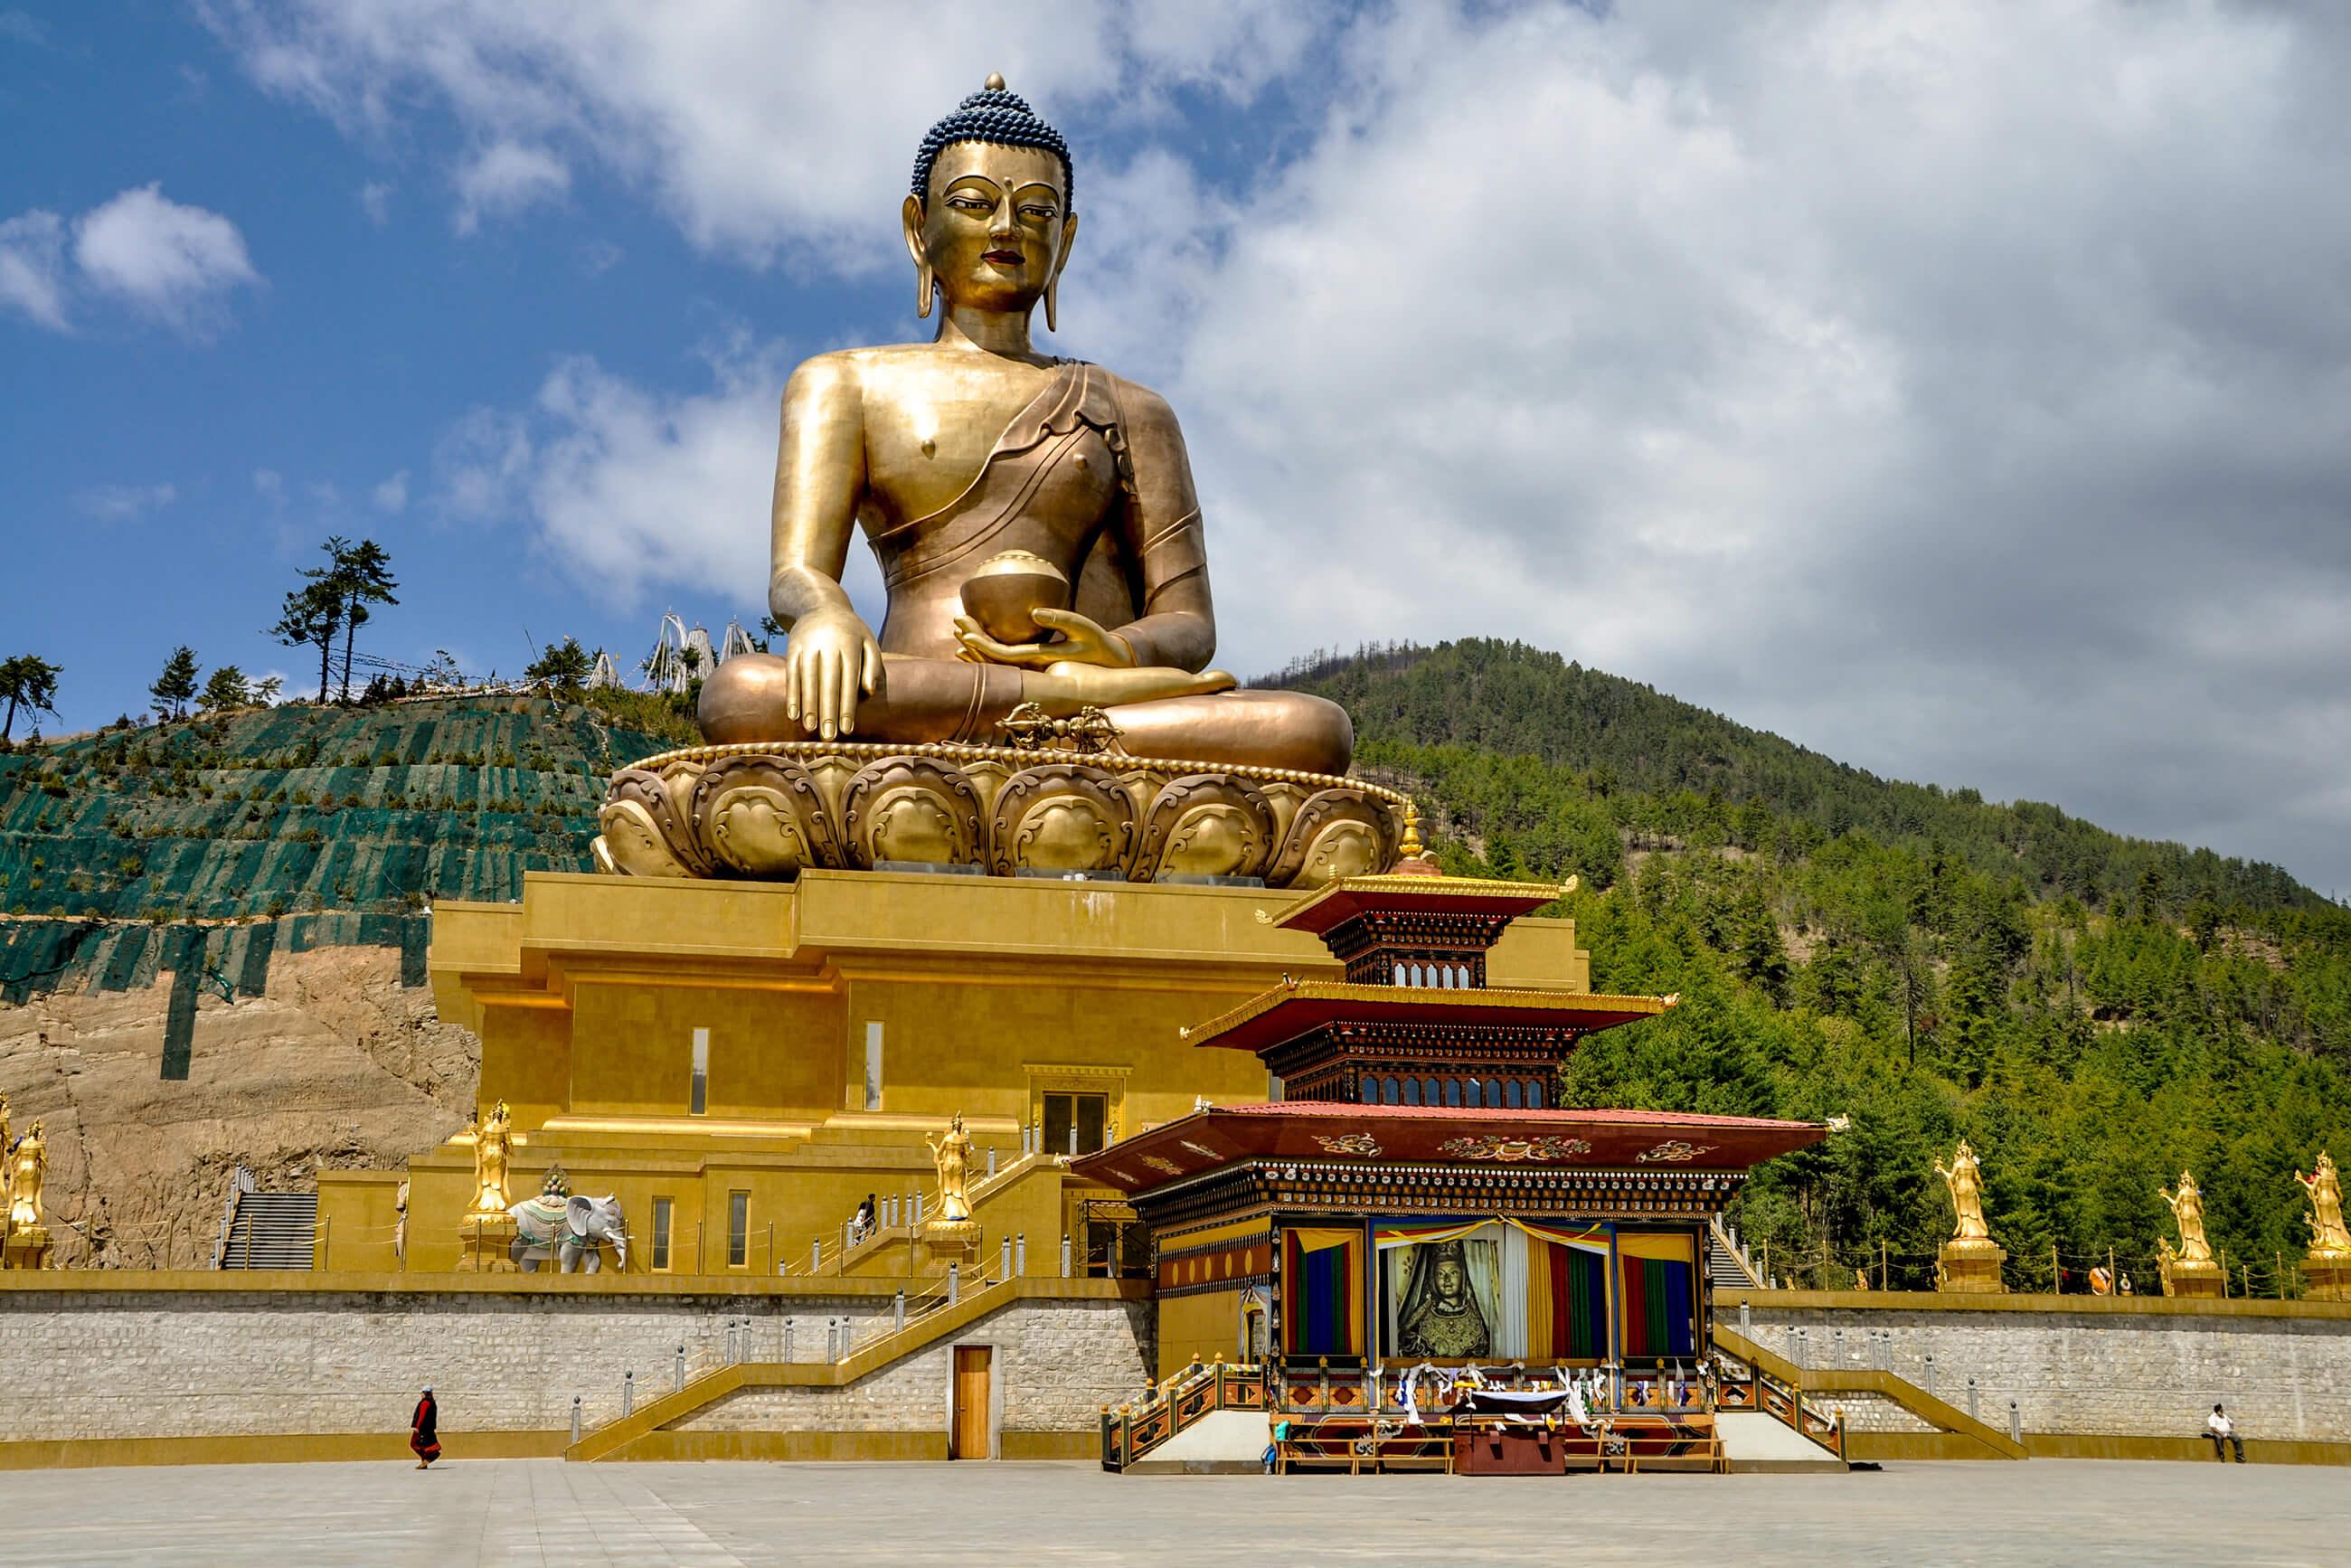 https://bubo.sk/uploads/galleries/4914/tomaskubus_bhutan_thimphu---obrovska-socha-budhu-patri-medzi-najvacsie-na-svete-4.jpg